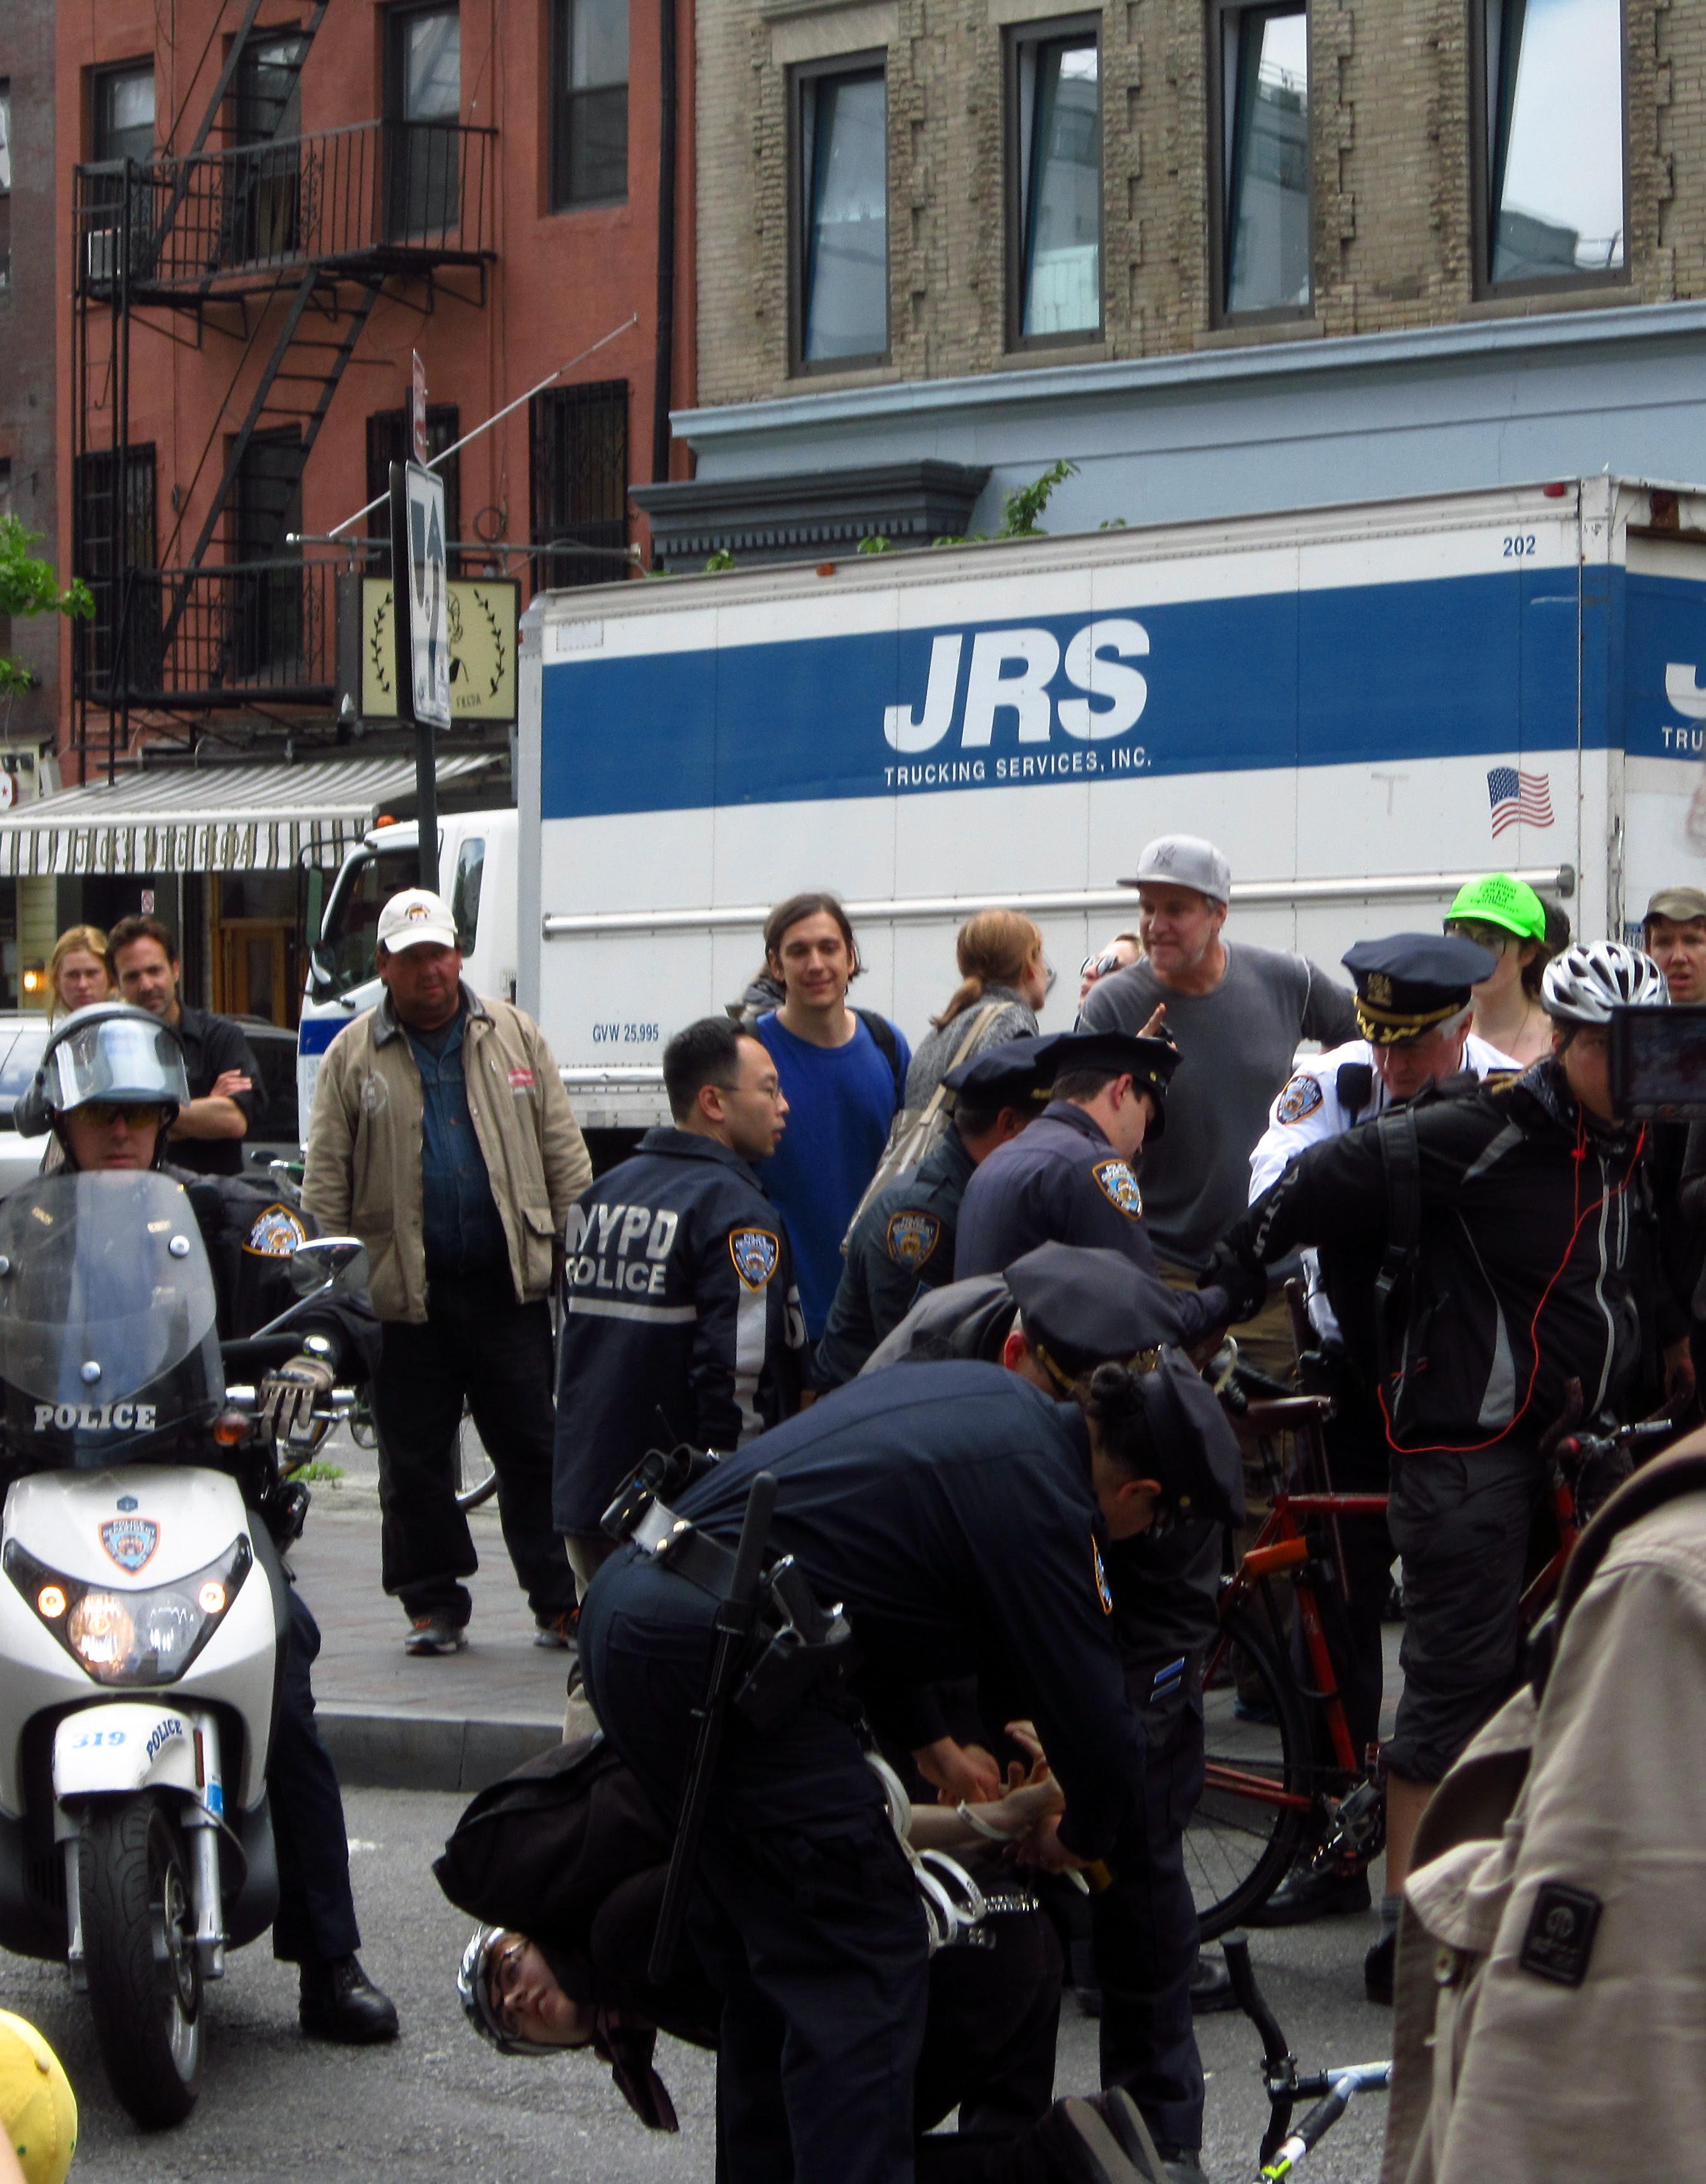 Police arrest 2 cyclists